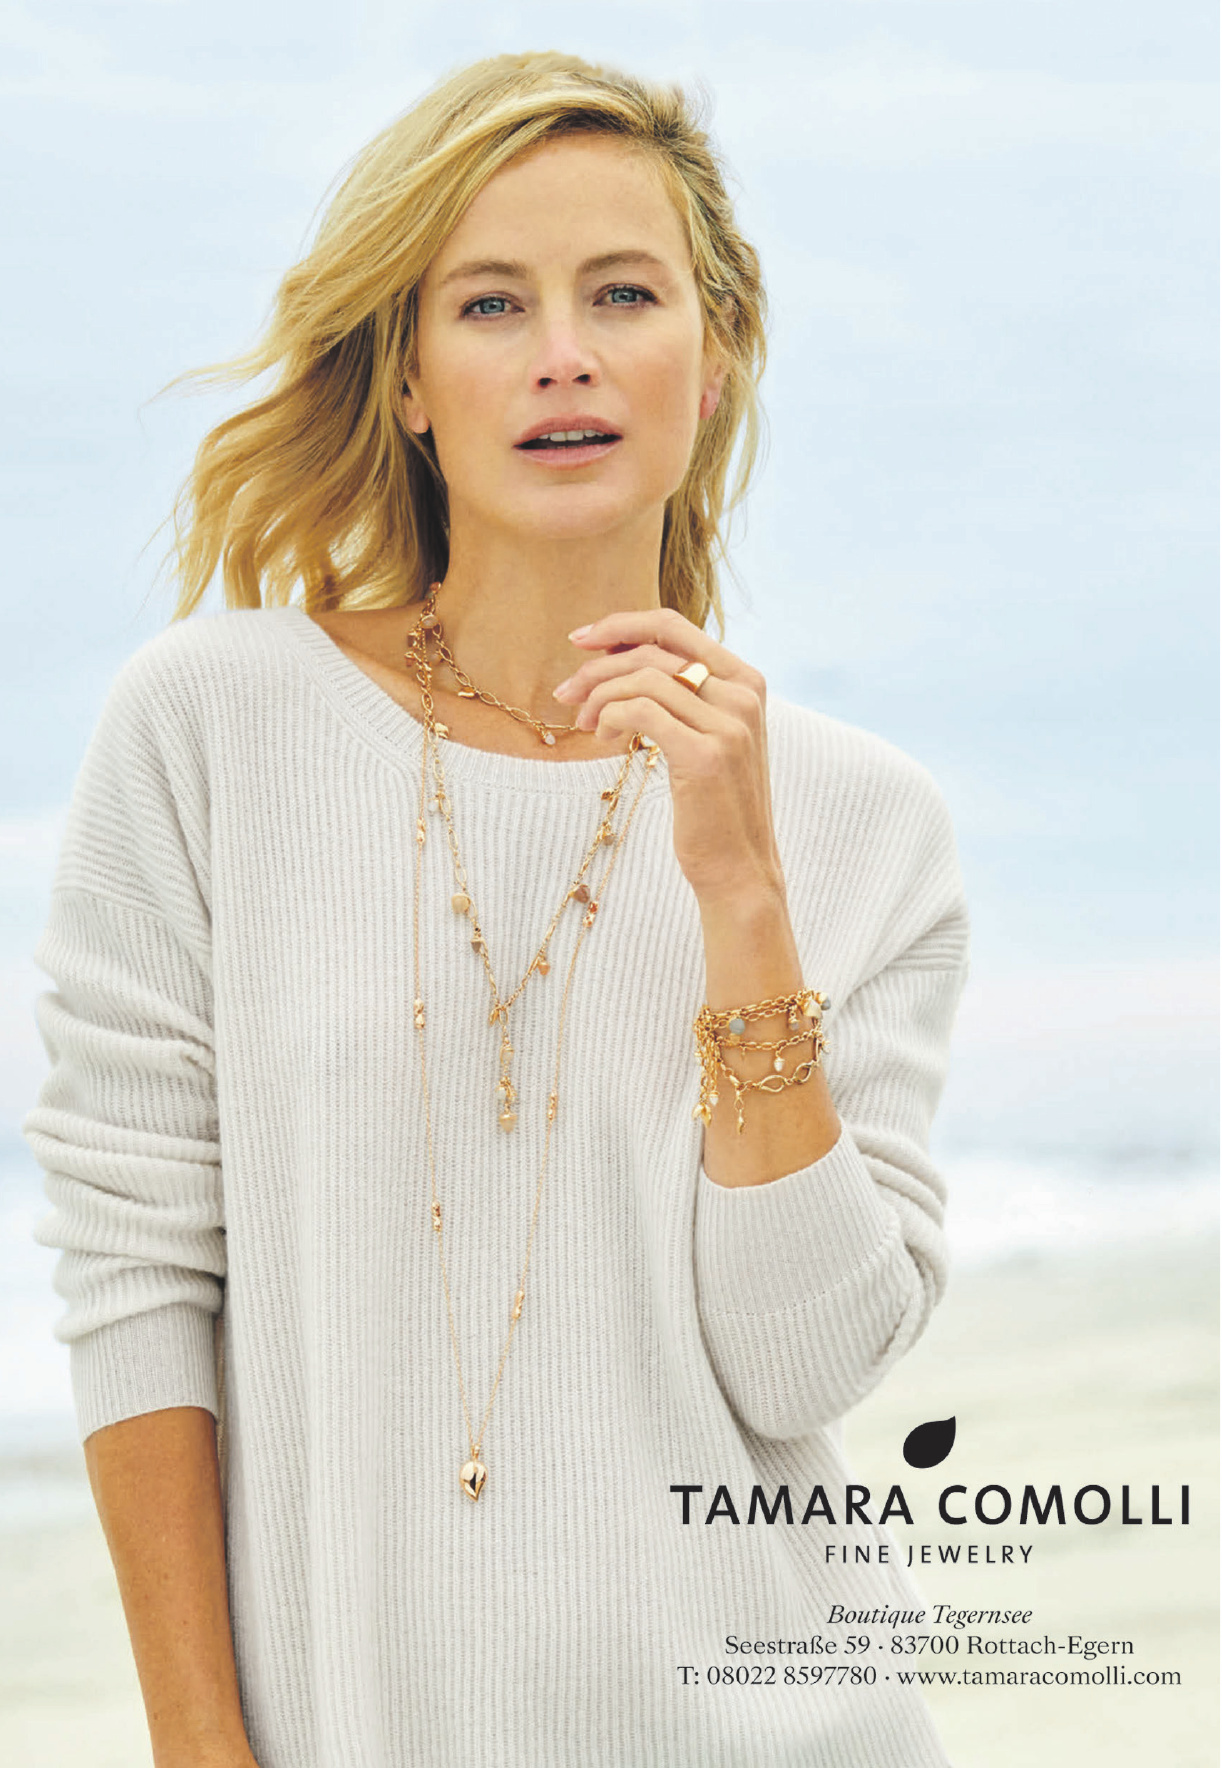 Tamara Comolli Fine Juwelry